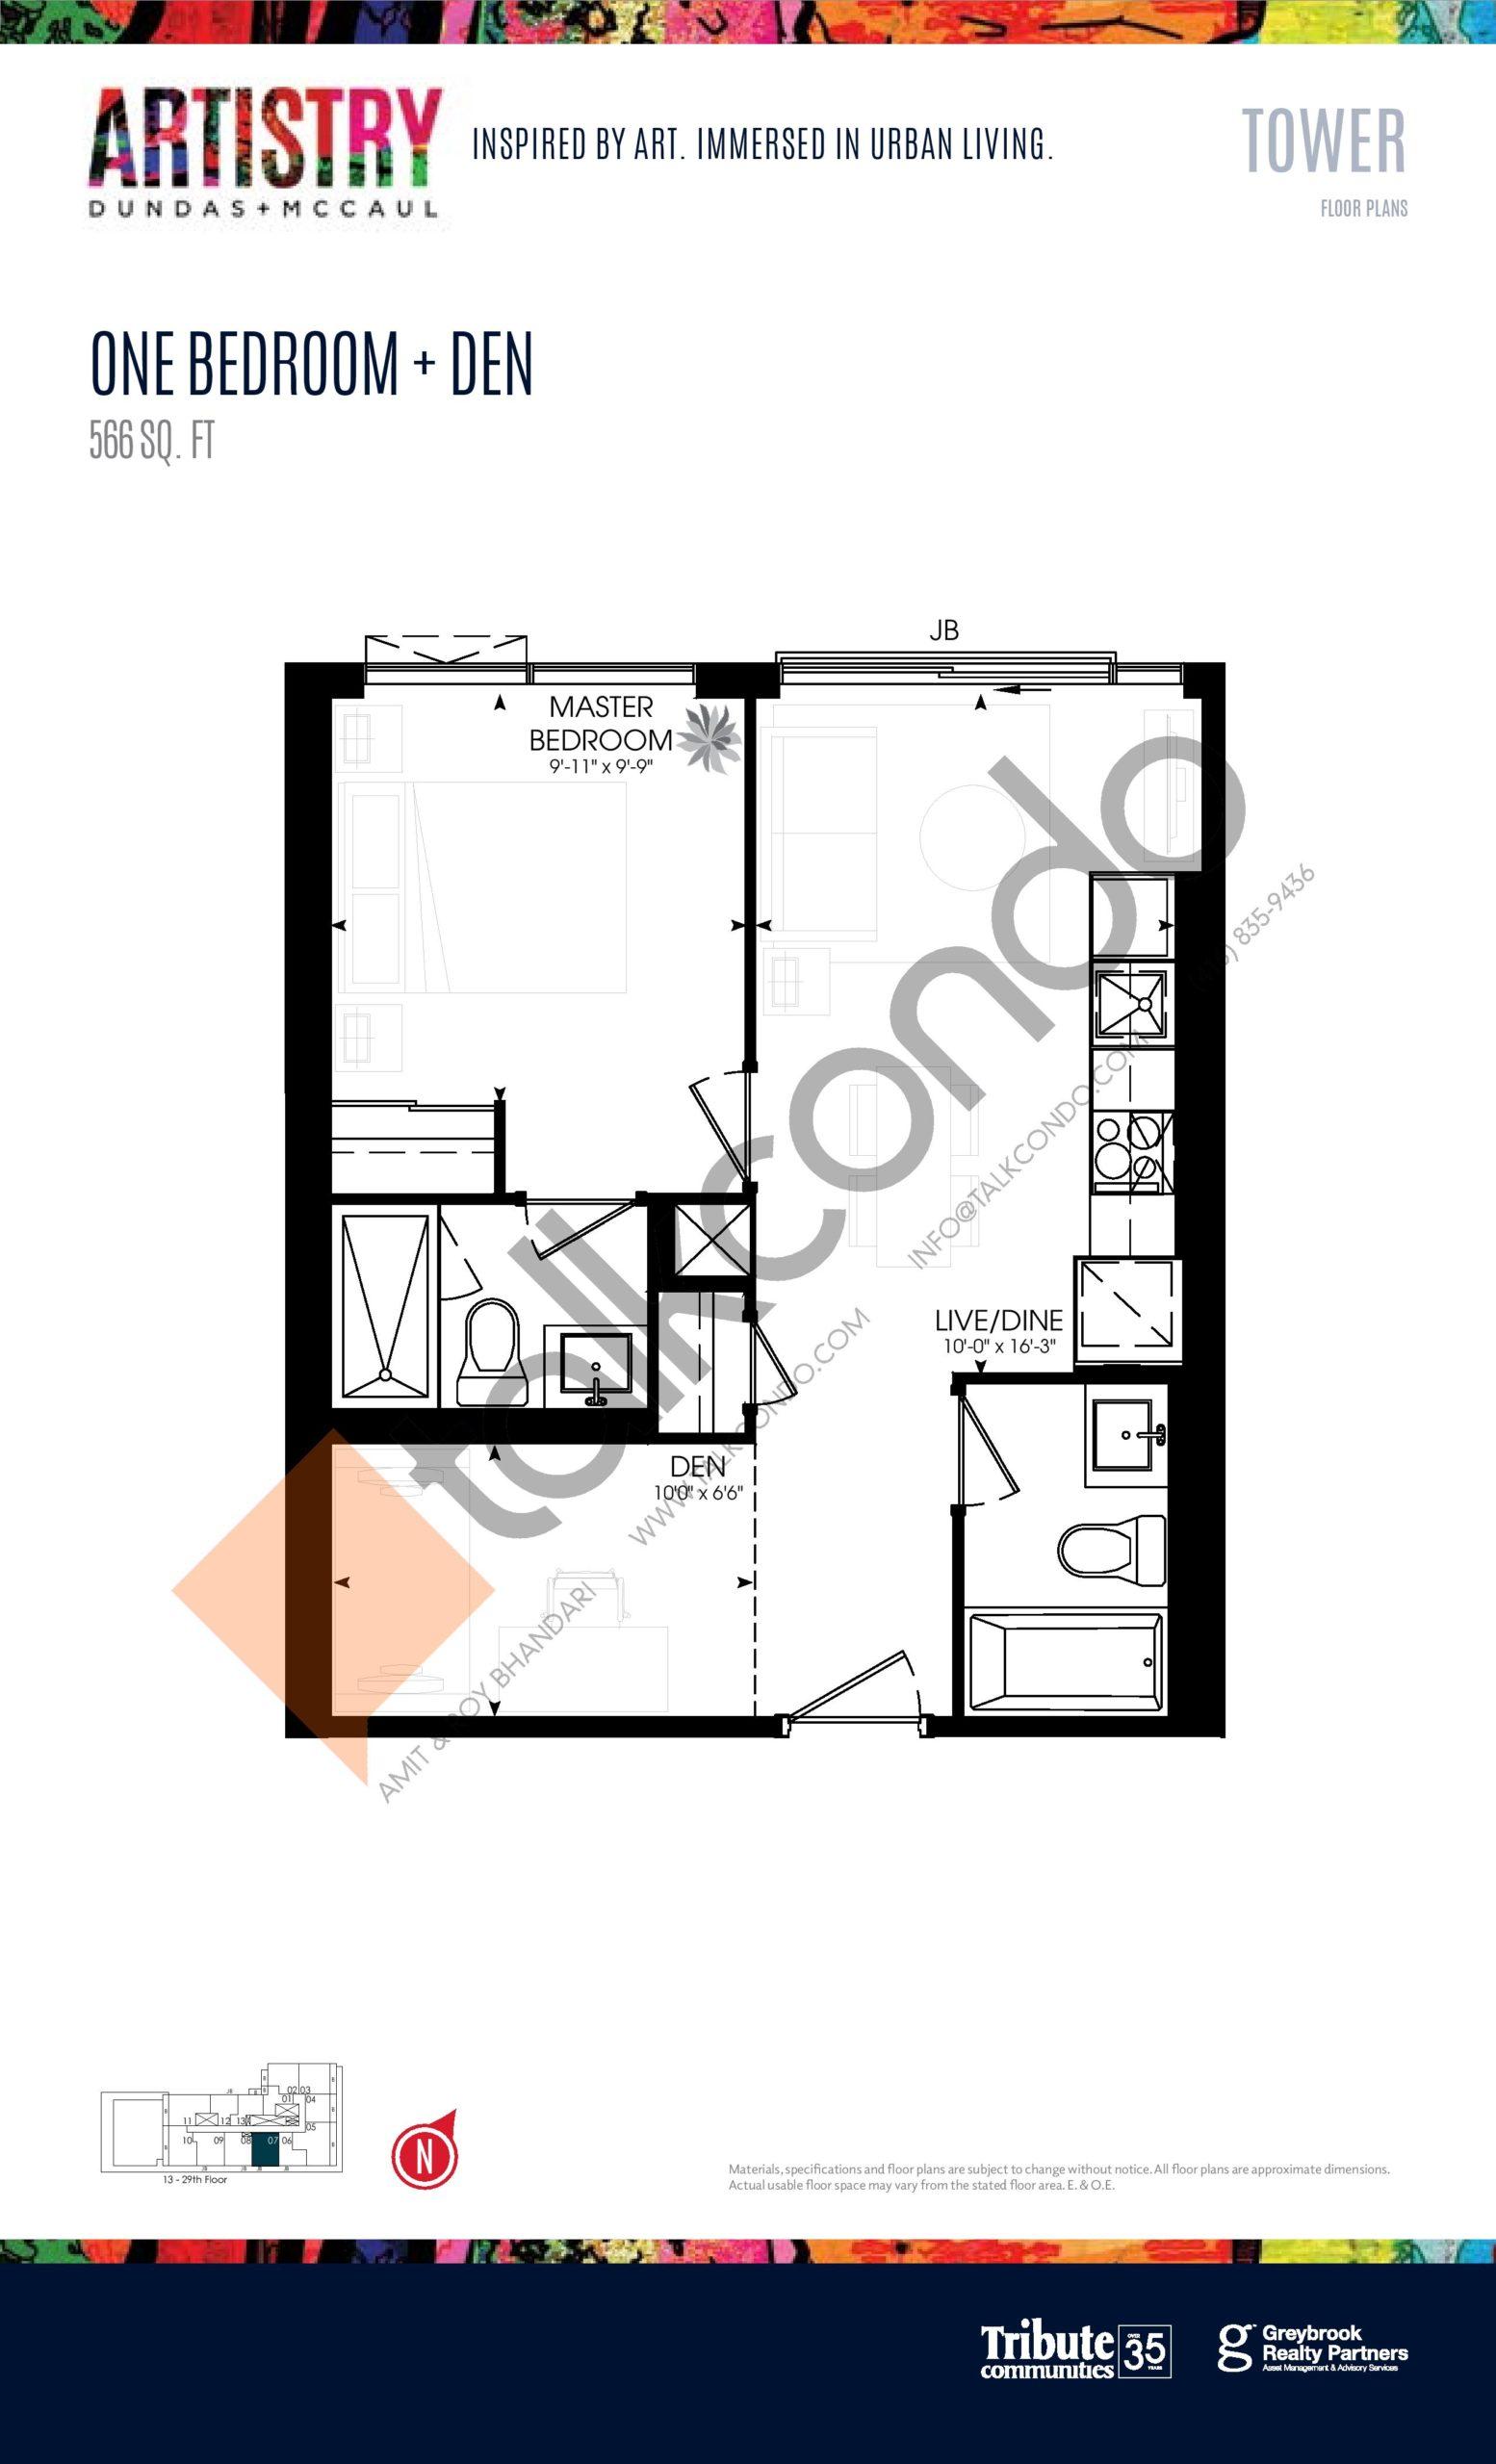 566 sq. ft. - Tower Floor Plan at Artistry Condos - 566 sq.ft